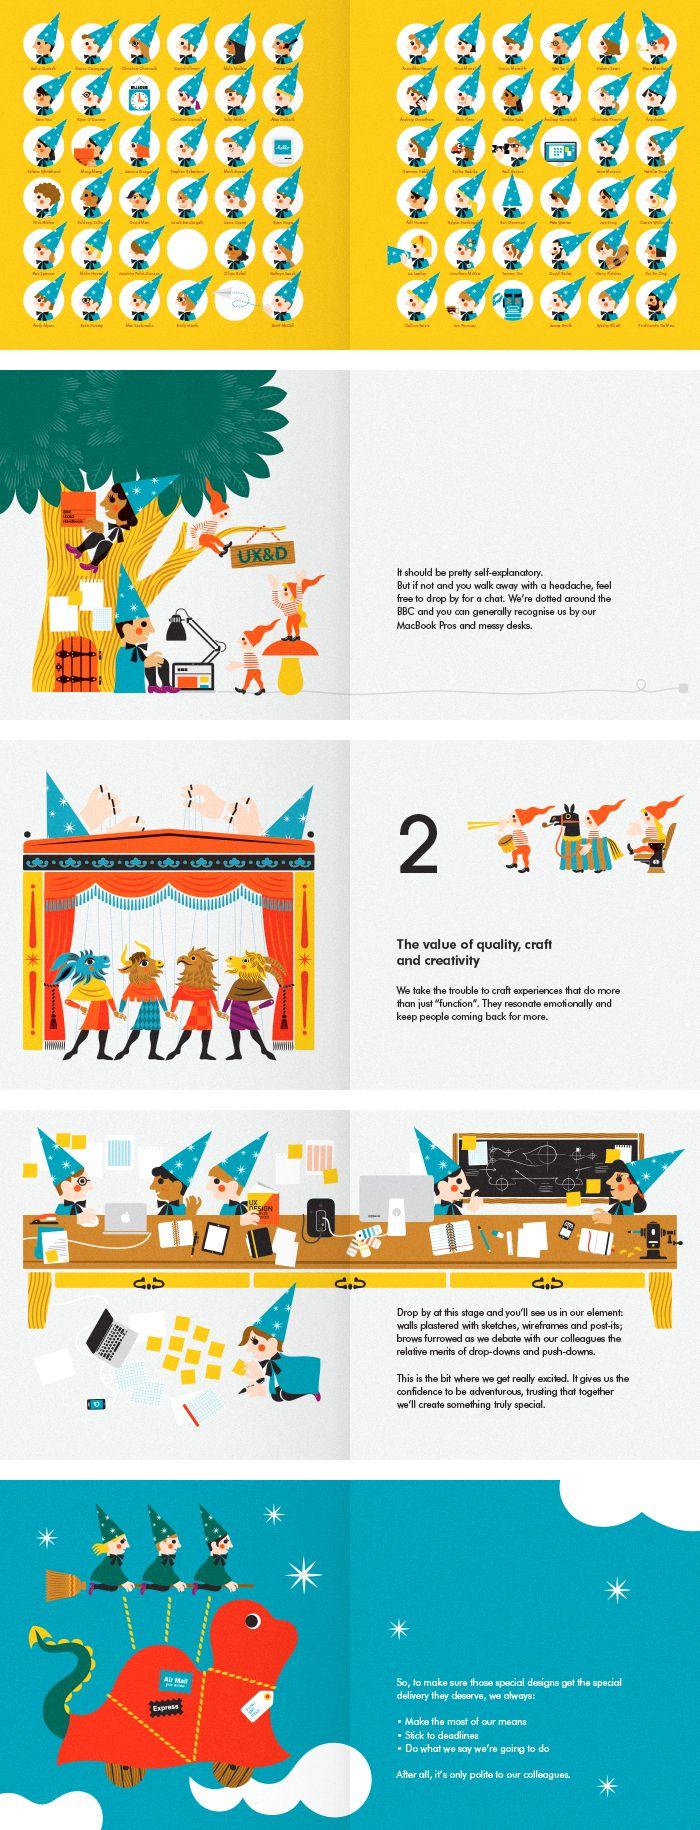 BBC UX&D team illustration in children's book format.